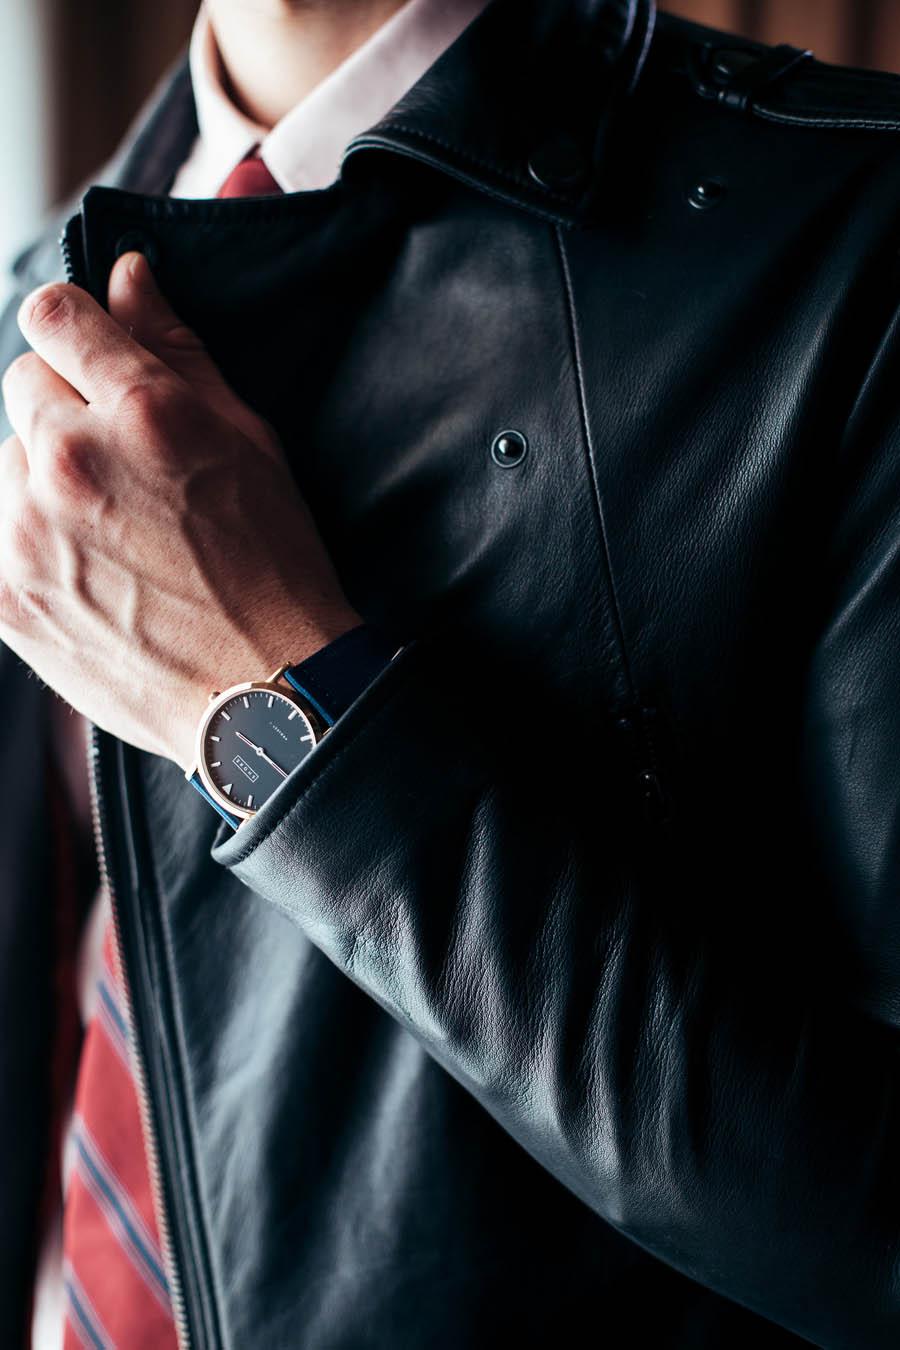 SHORE Watch × Leather Jacket × Tie